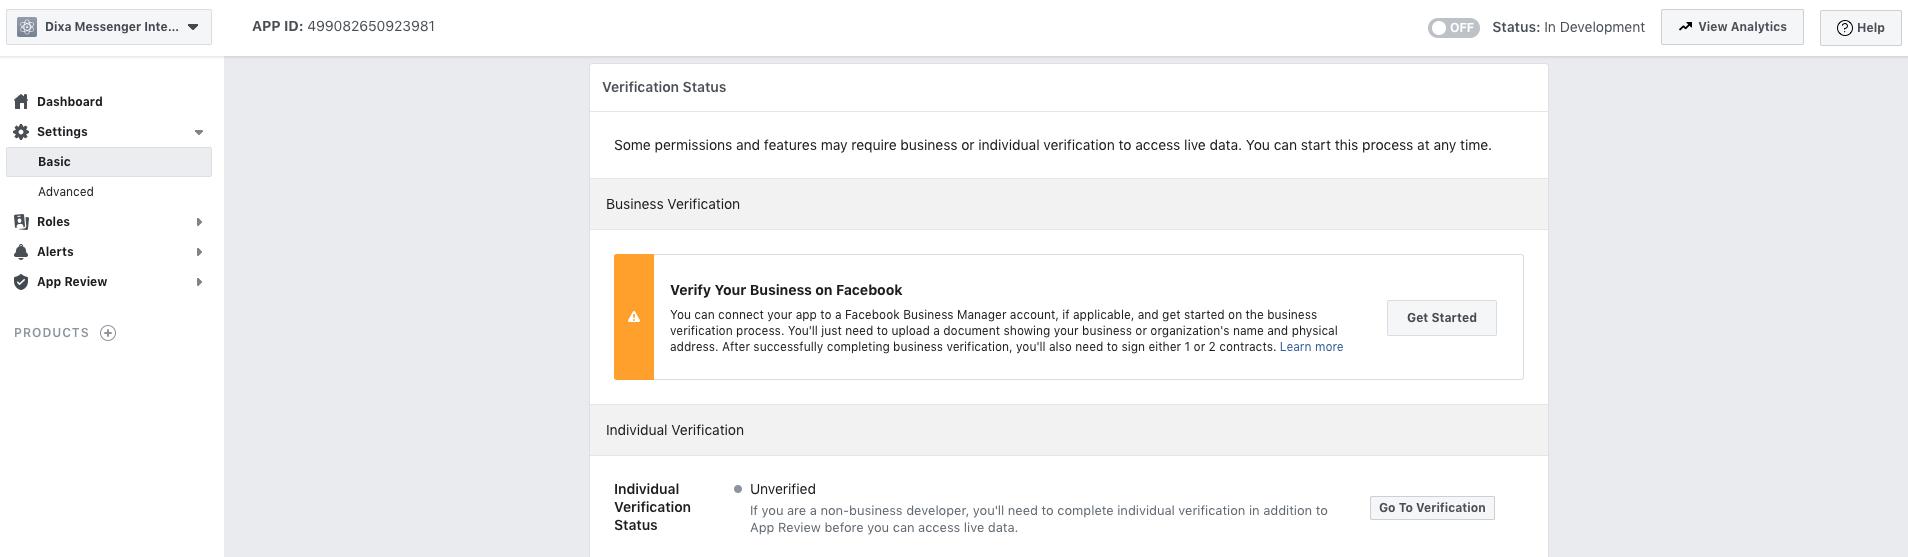 Facebook: Step 1 - Create Facebook App - Dixa Support